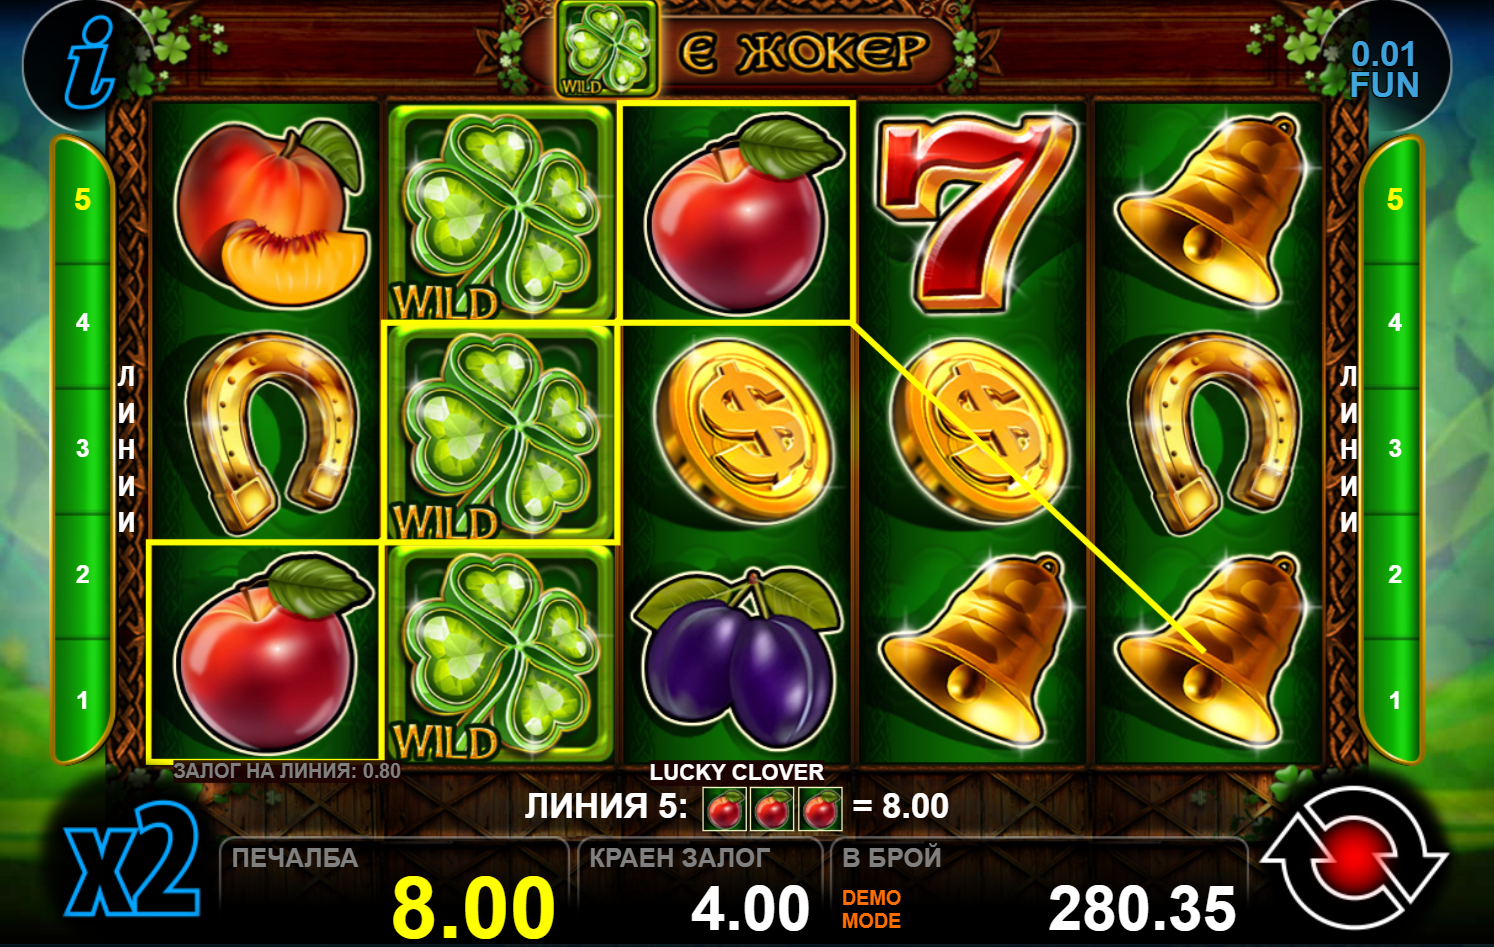 lucky clover ct gaming-komarbet.com